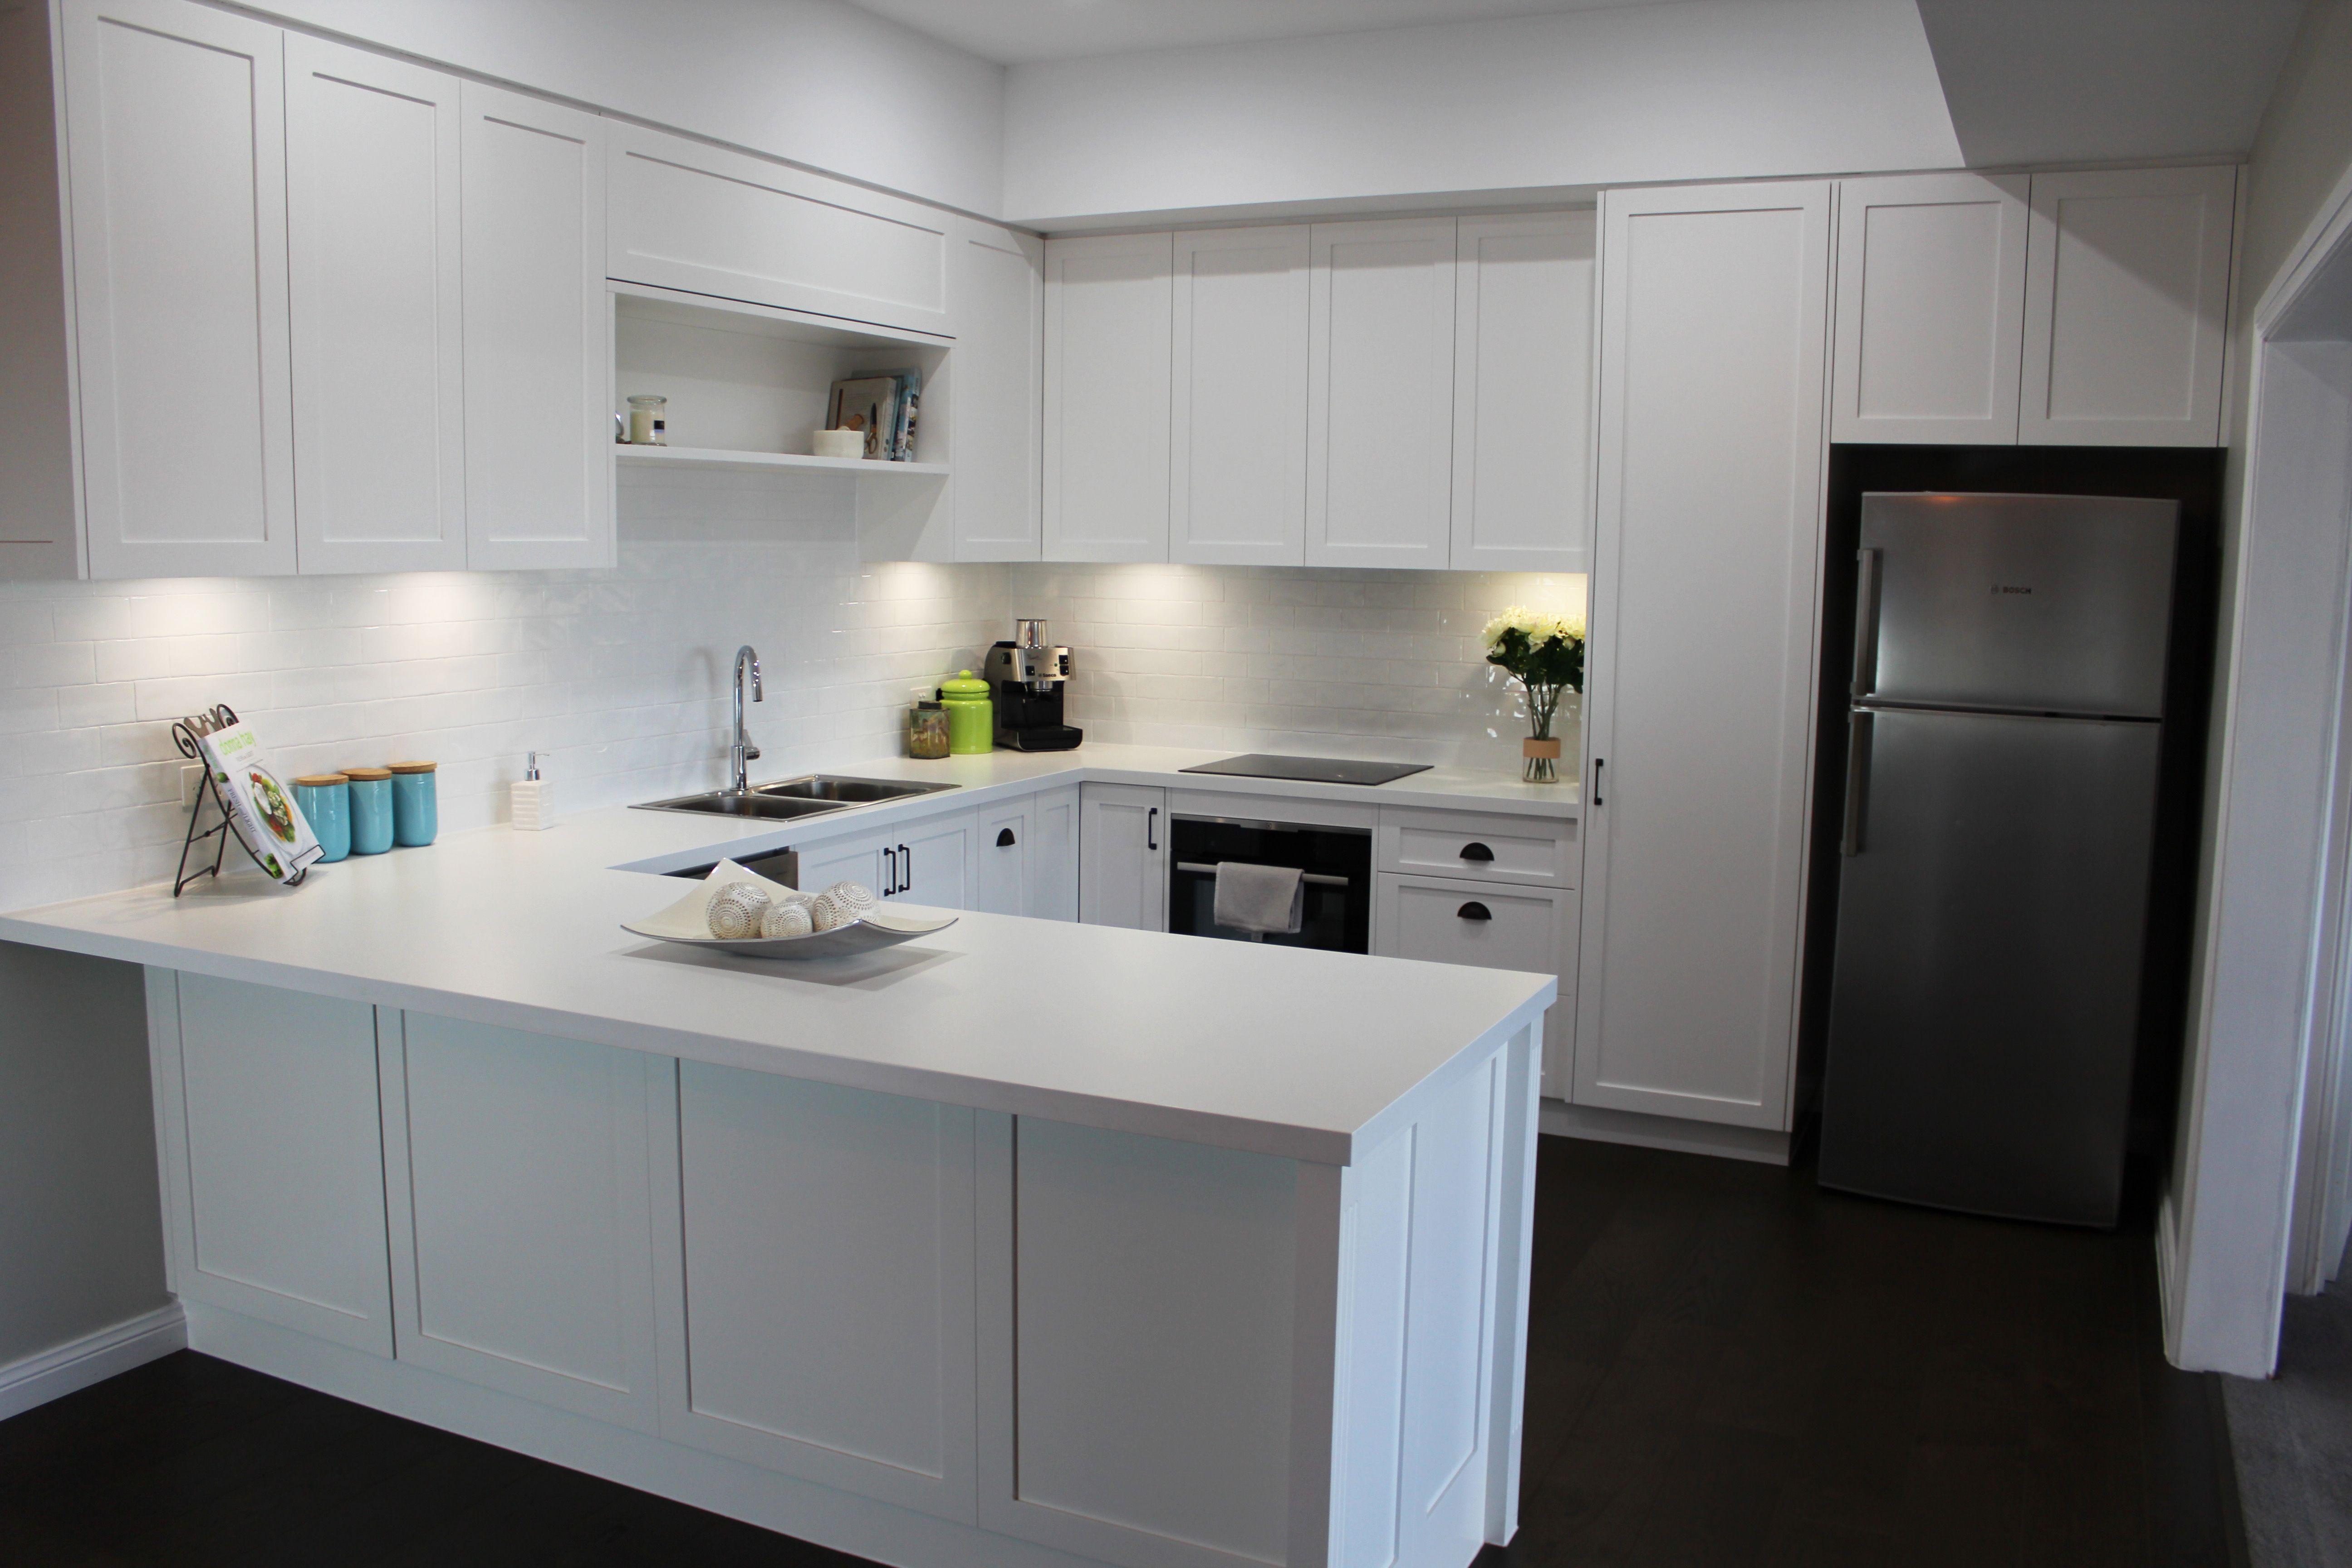 Benchtop polytec classic white matt 40mm abs edge panels for Classic white kitchen designs